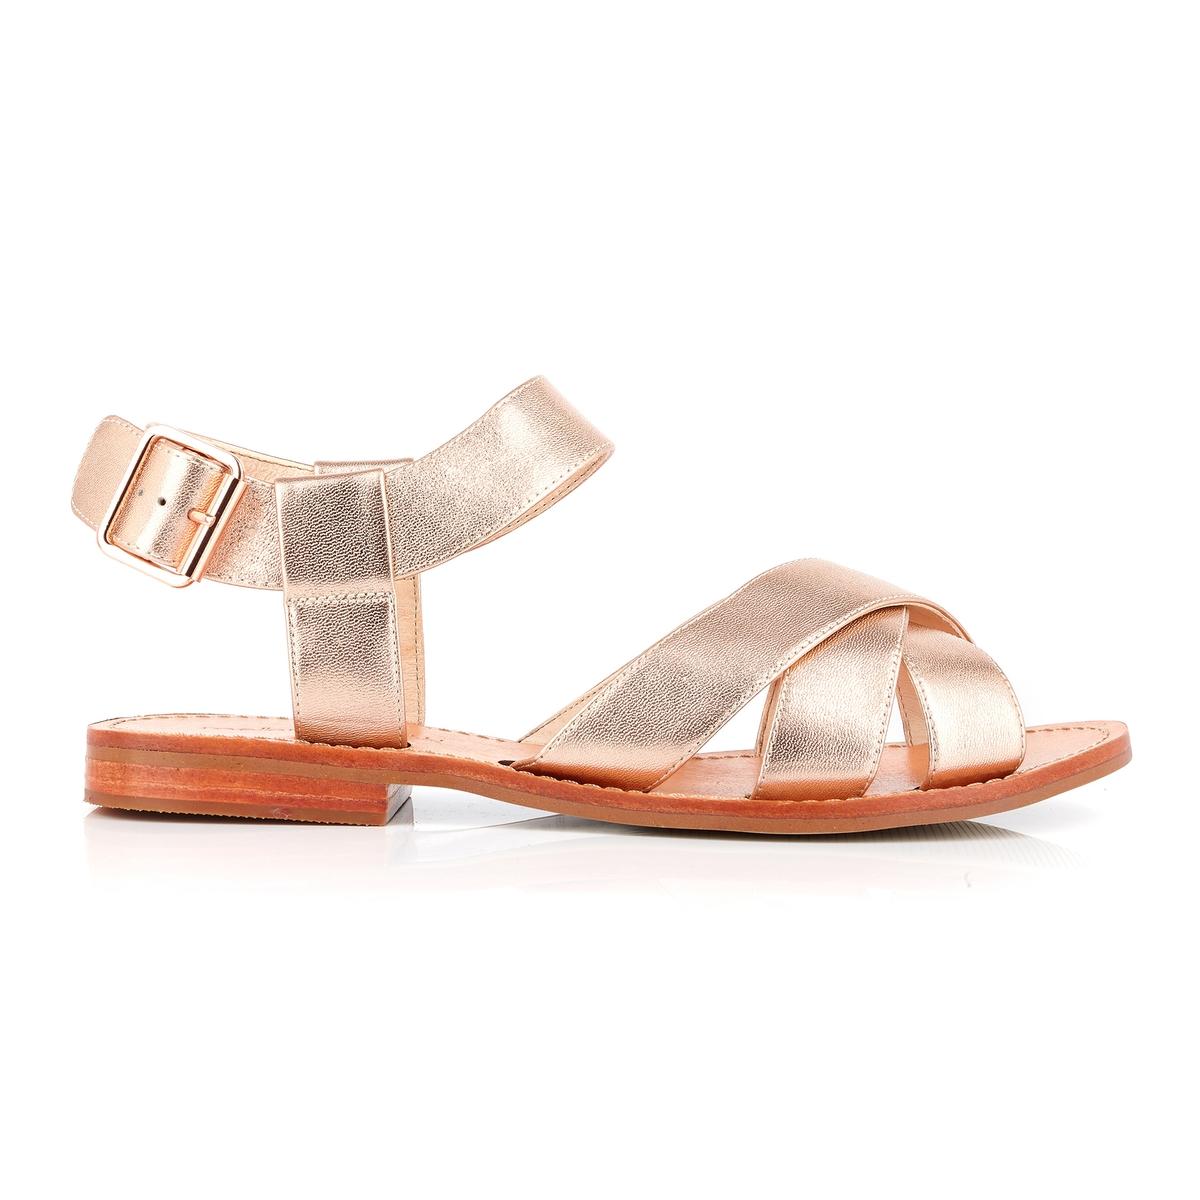 Босоножки кожаные на плоском каблуке Daline босоножки кожаные с кисточками на плоском каблуке